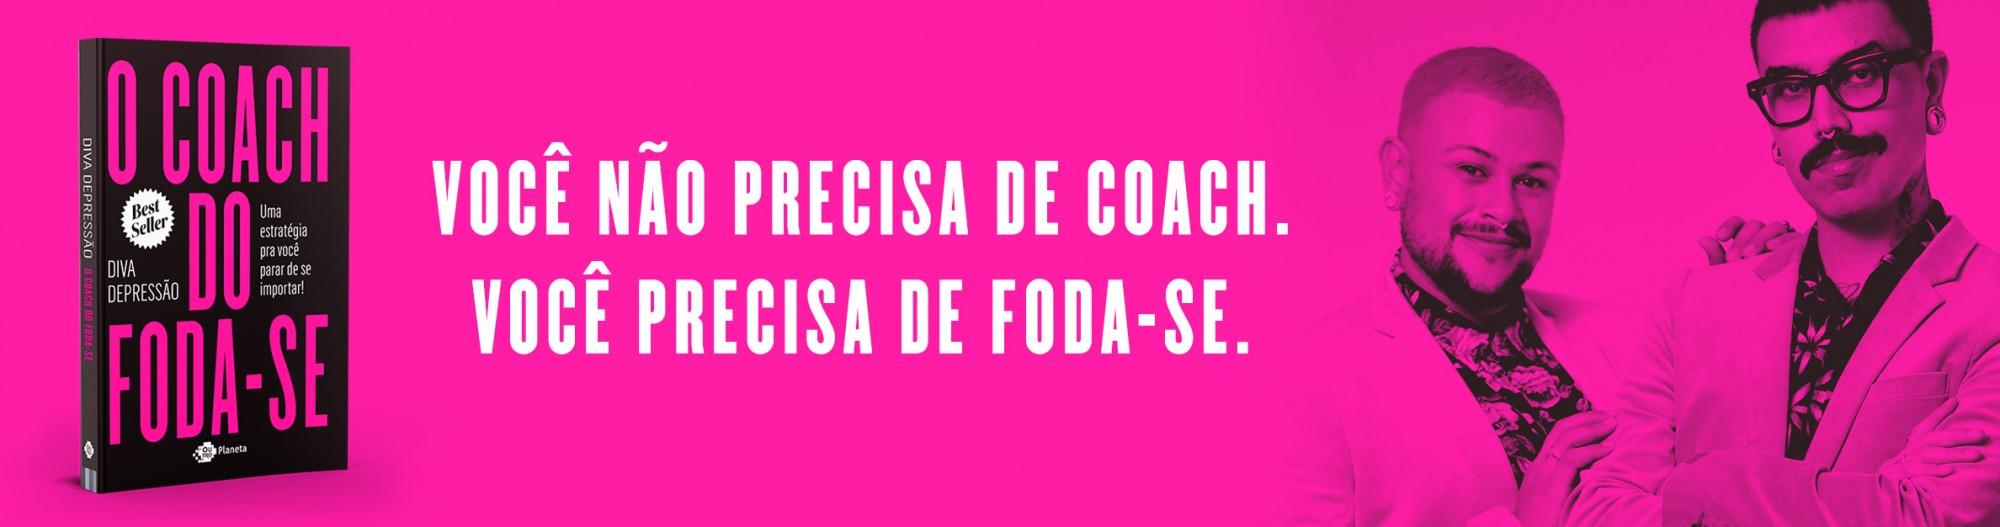 212_1_Coach.jpg